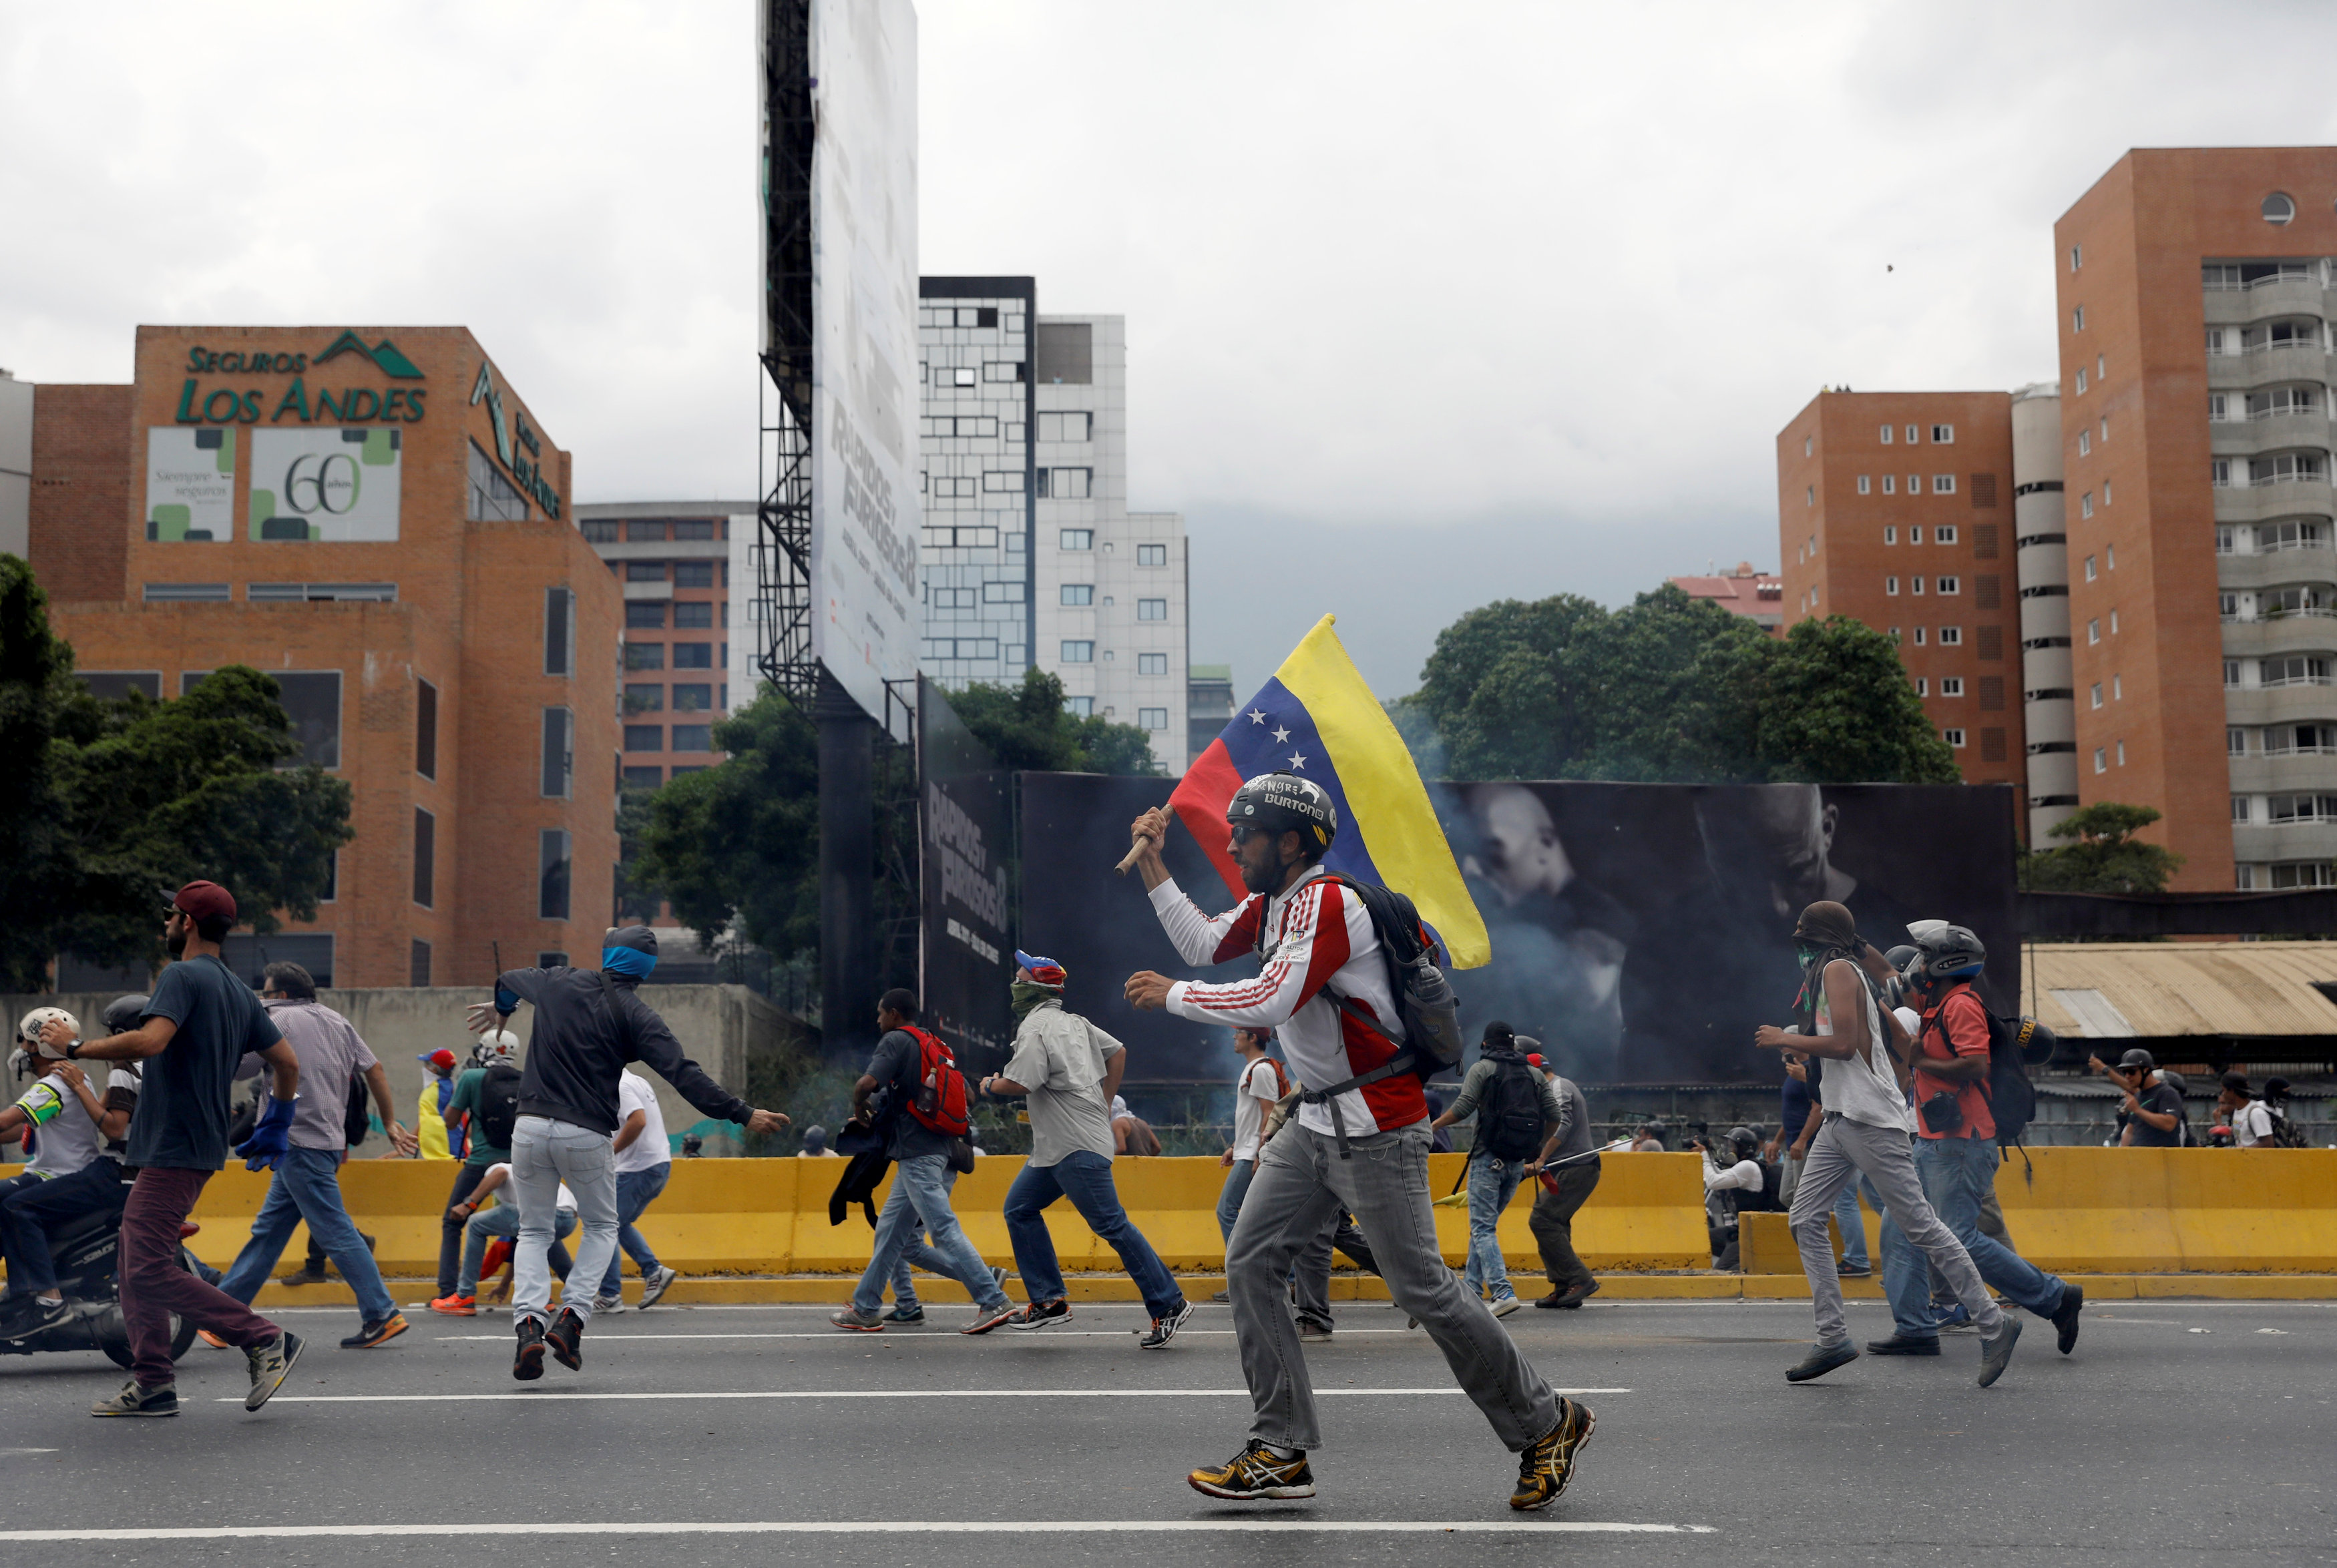 Opposition supporters rally against Venezuela's President Nicolas Maduro in Caracas, Venezuela April 20, 2017. REUTERS/Carlos Garcia Rawlins